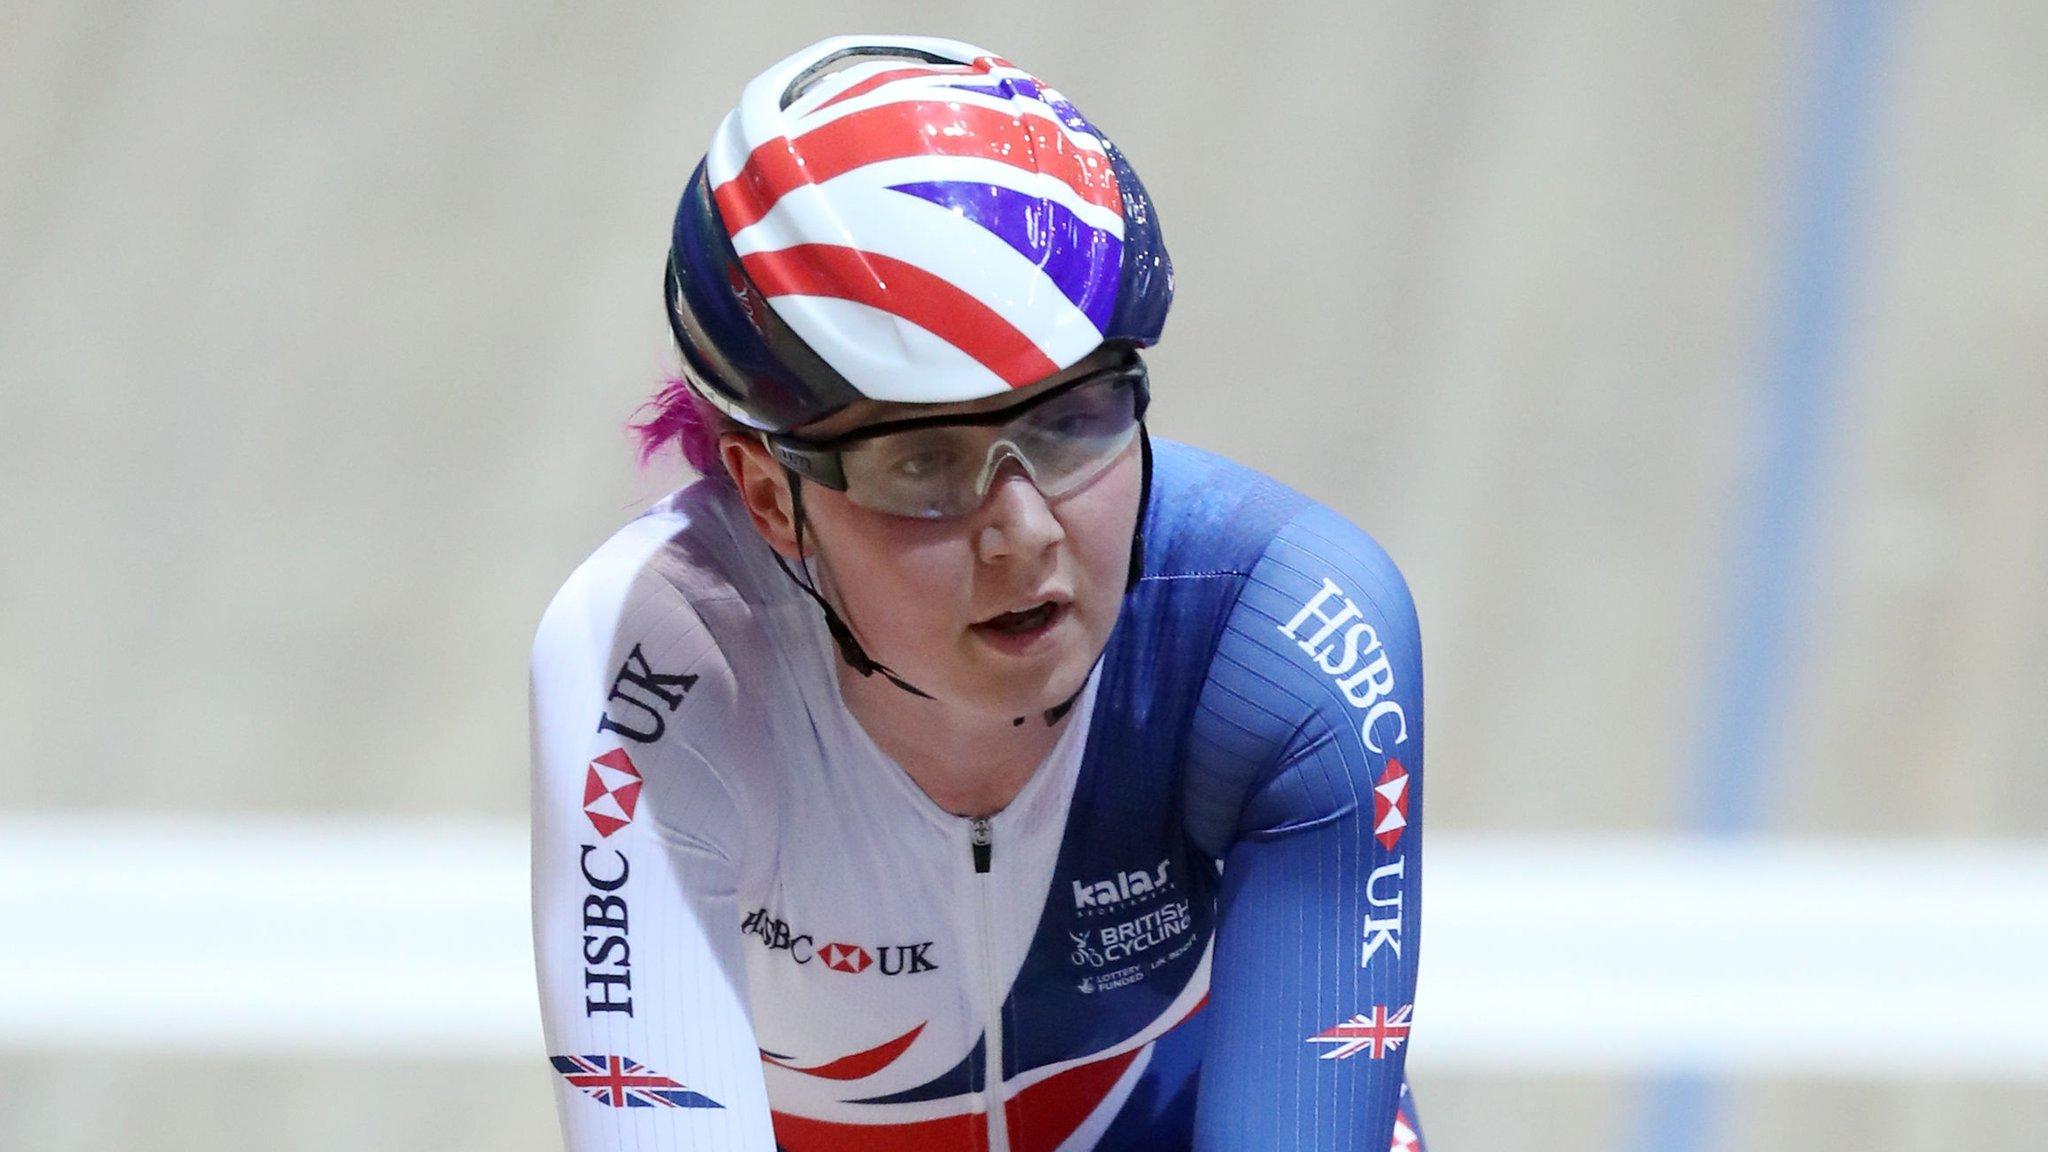 European Track Championships 2017: Katie Archibald wins women's individual pursuit